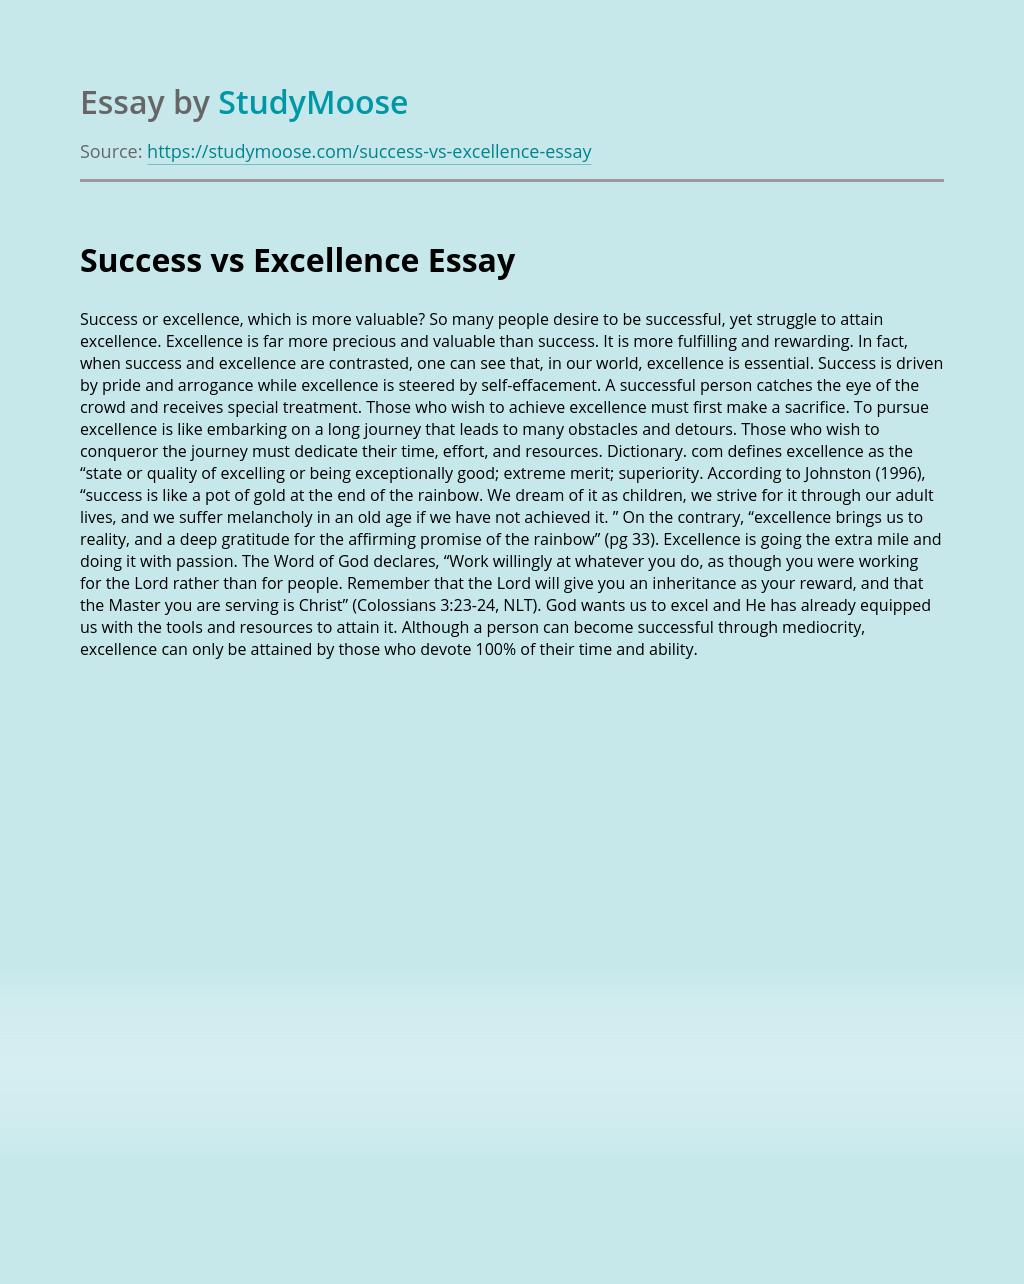 Success vs Excellence